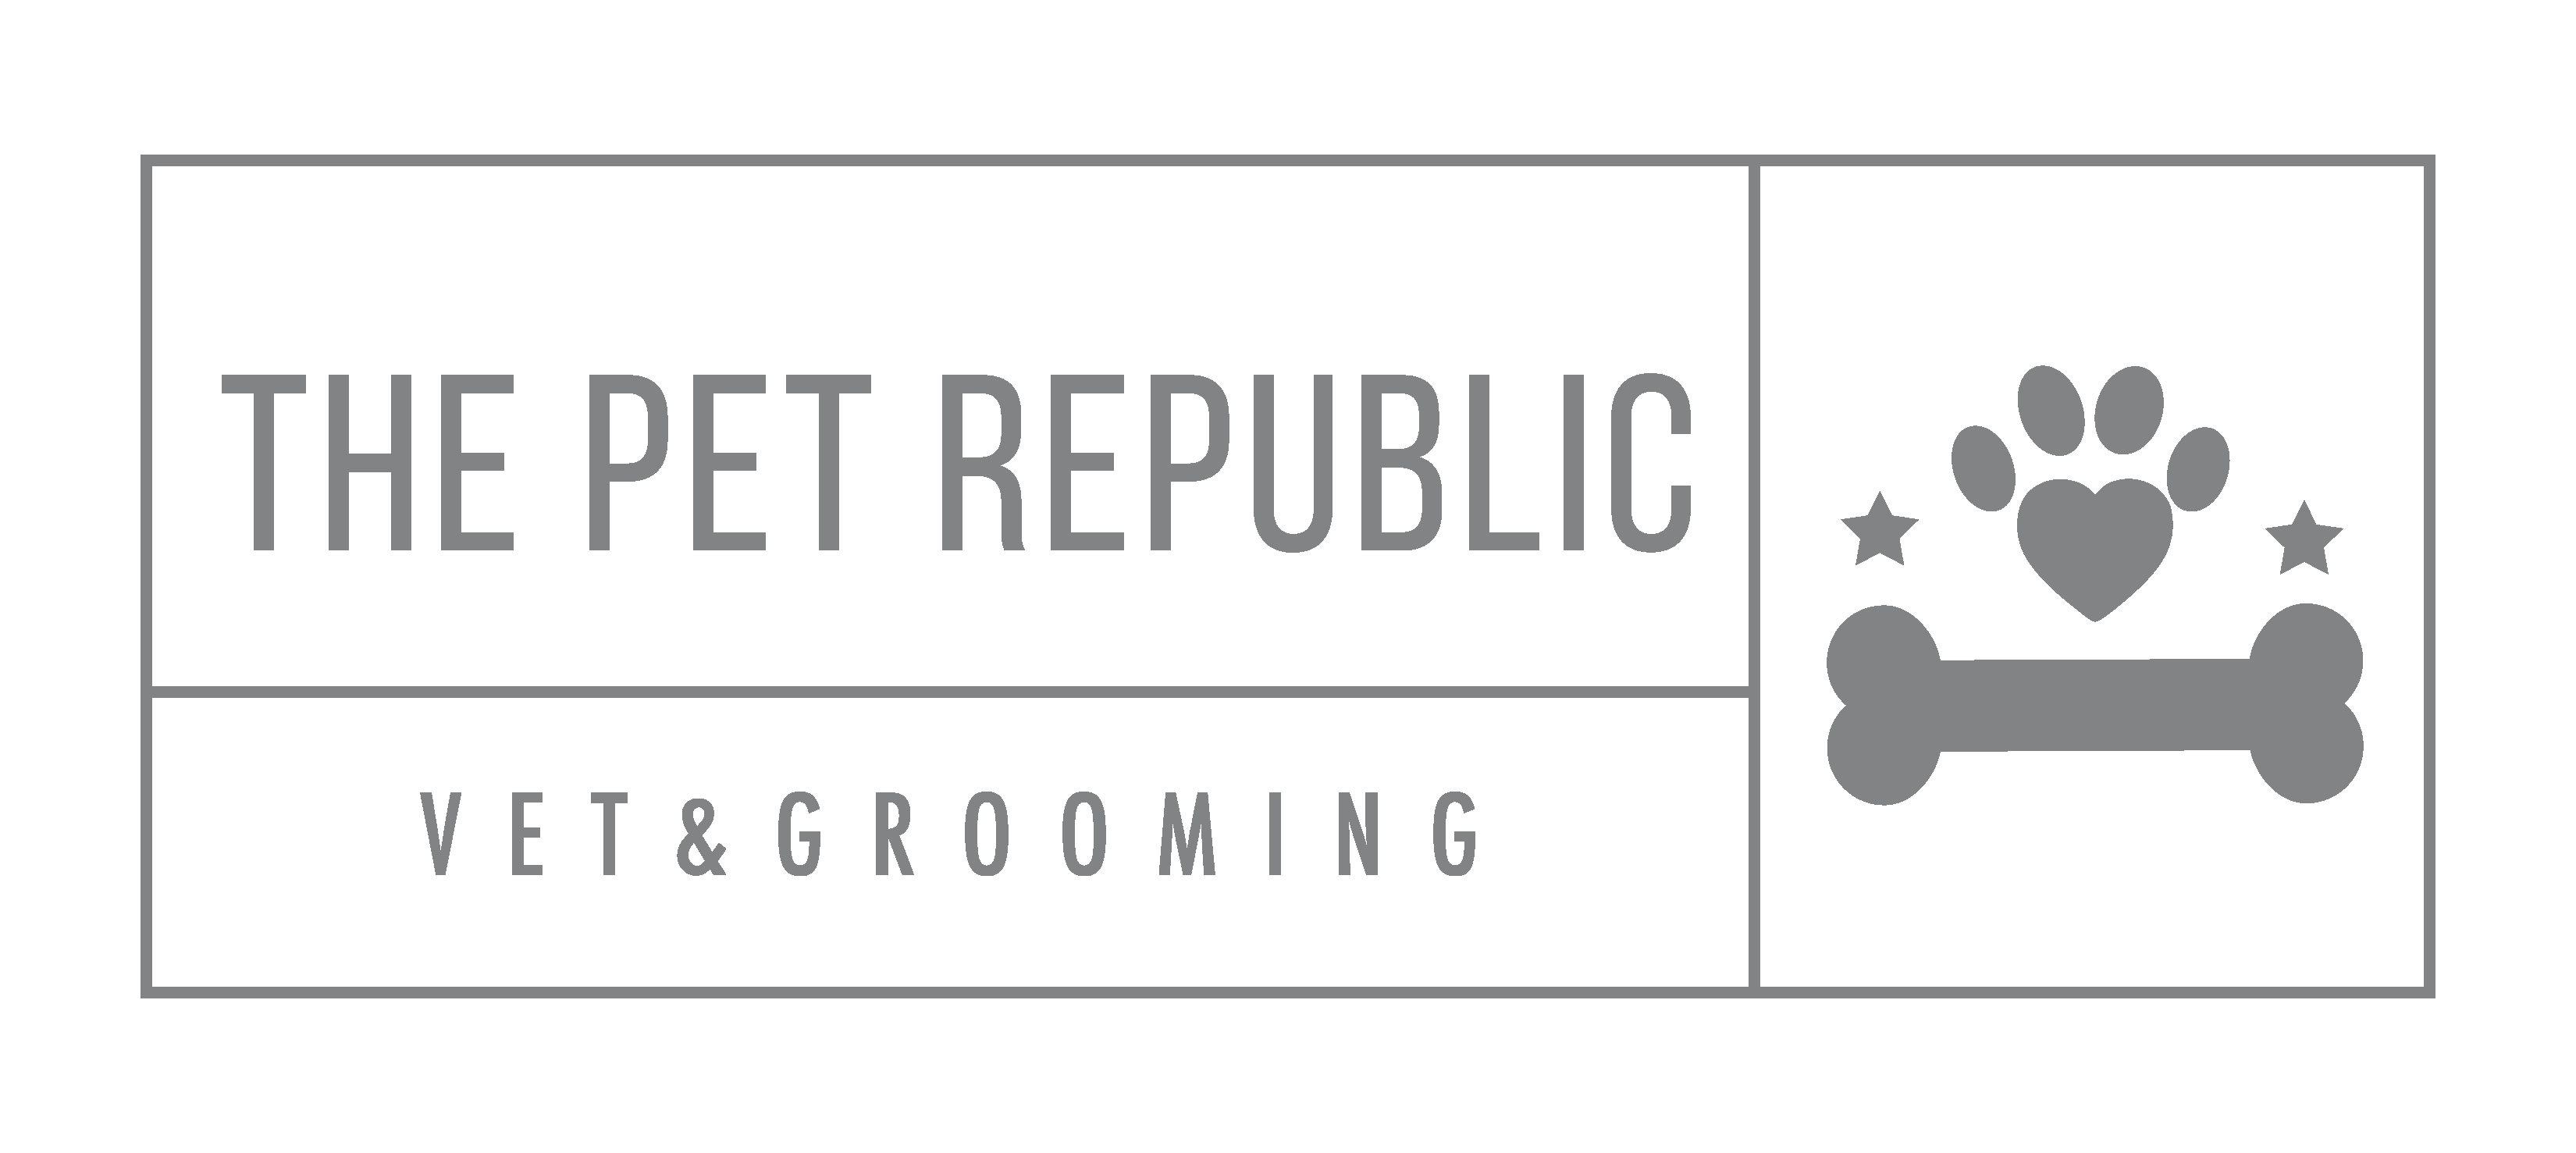 The Pet Republic